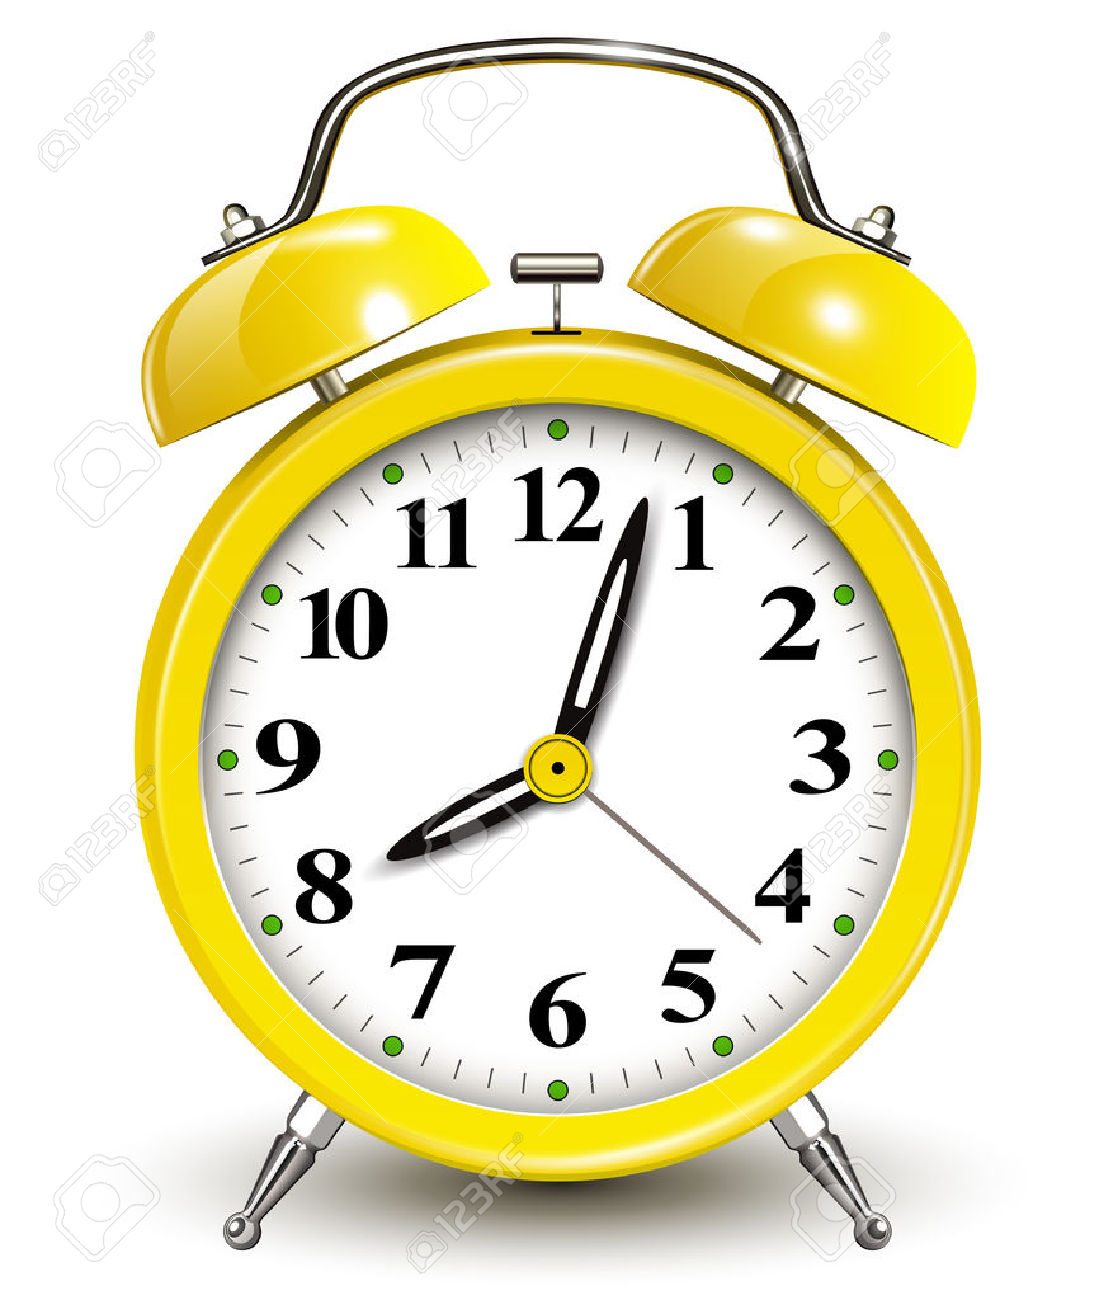 stock illustrations cliparts. Countdown clock clipart